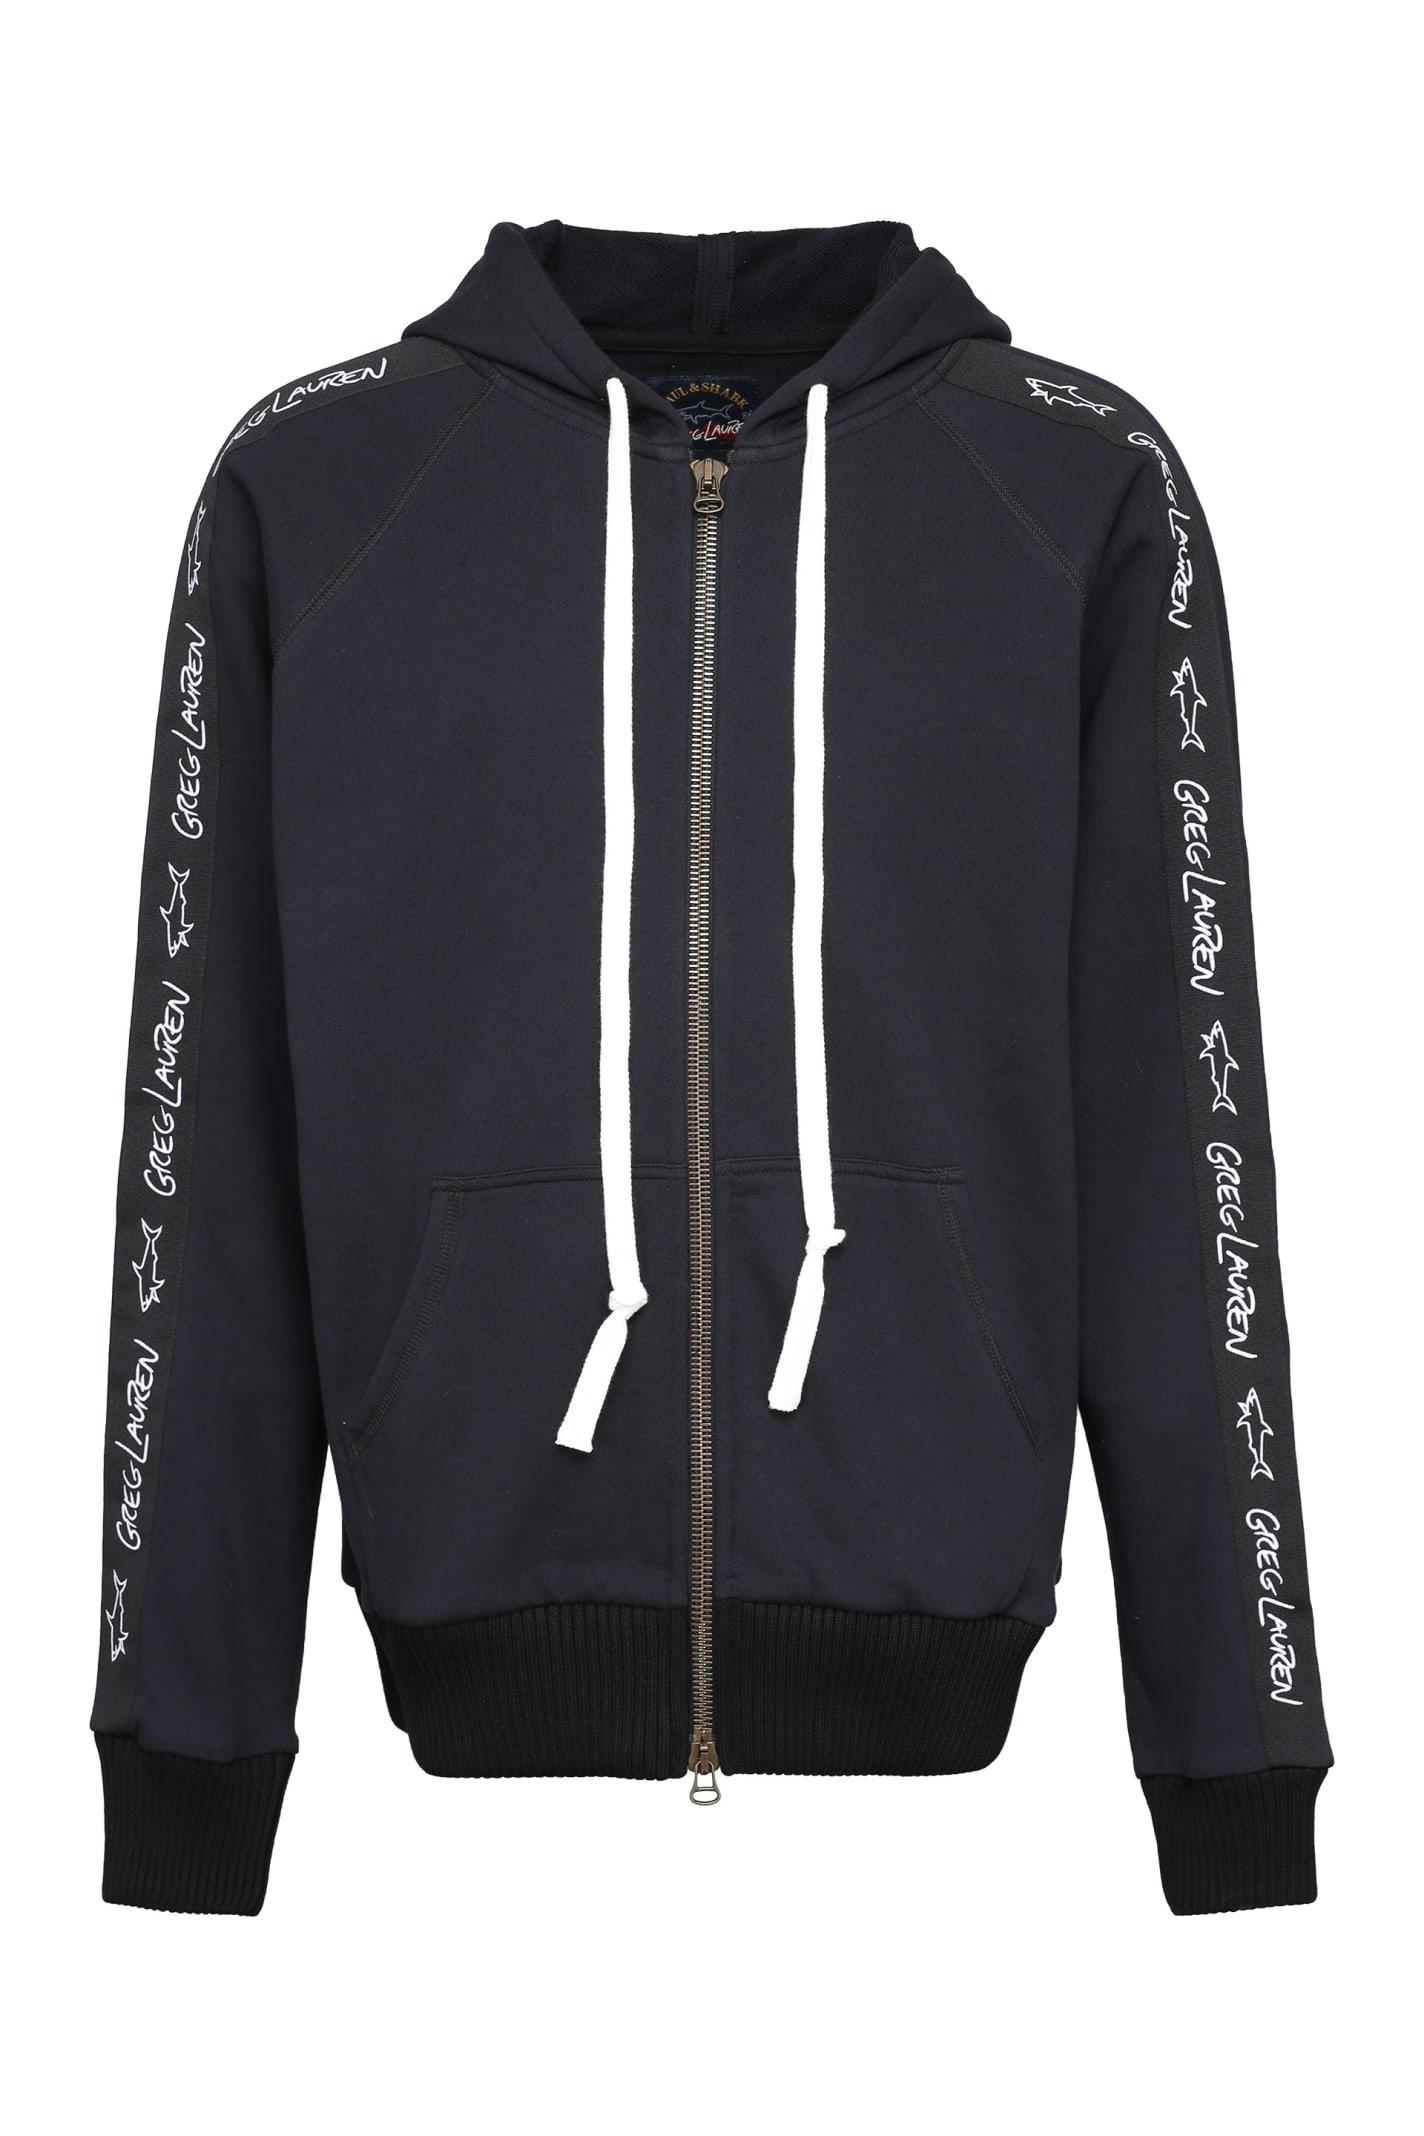 Paul & Shark Full Zip Sweatshirt With Side Stripes